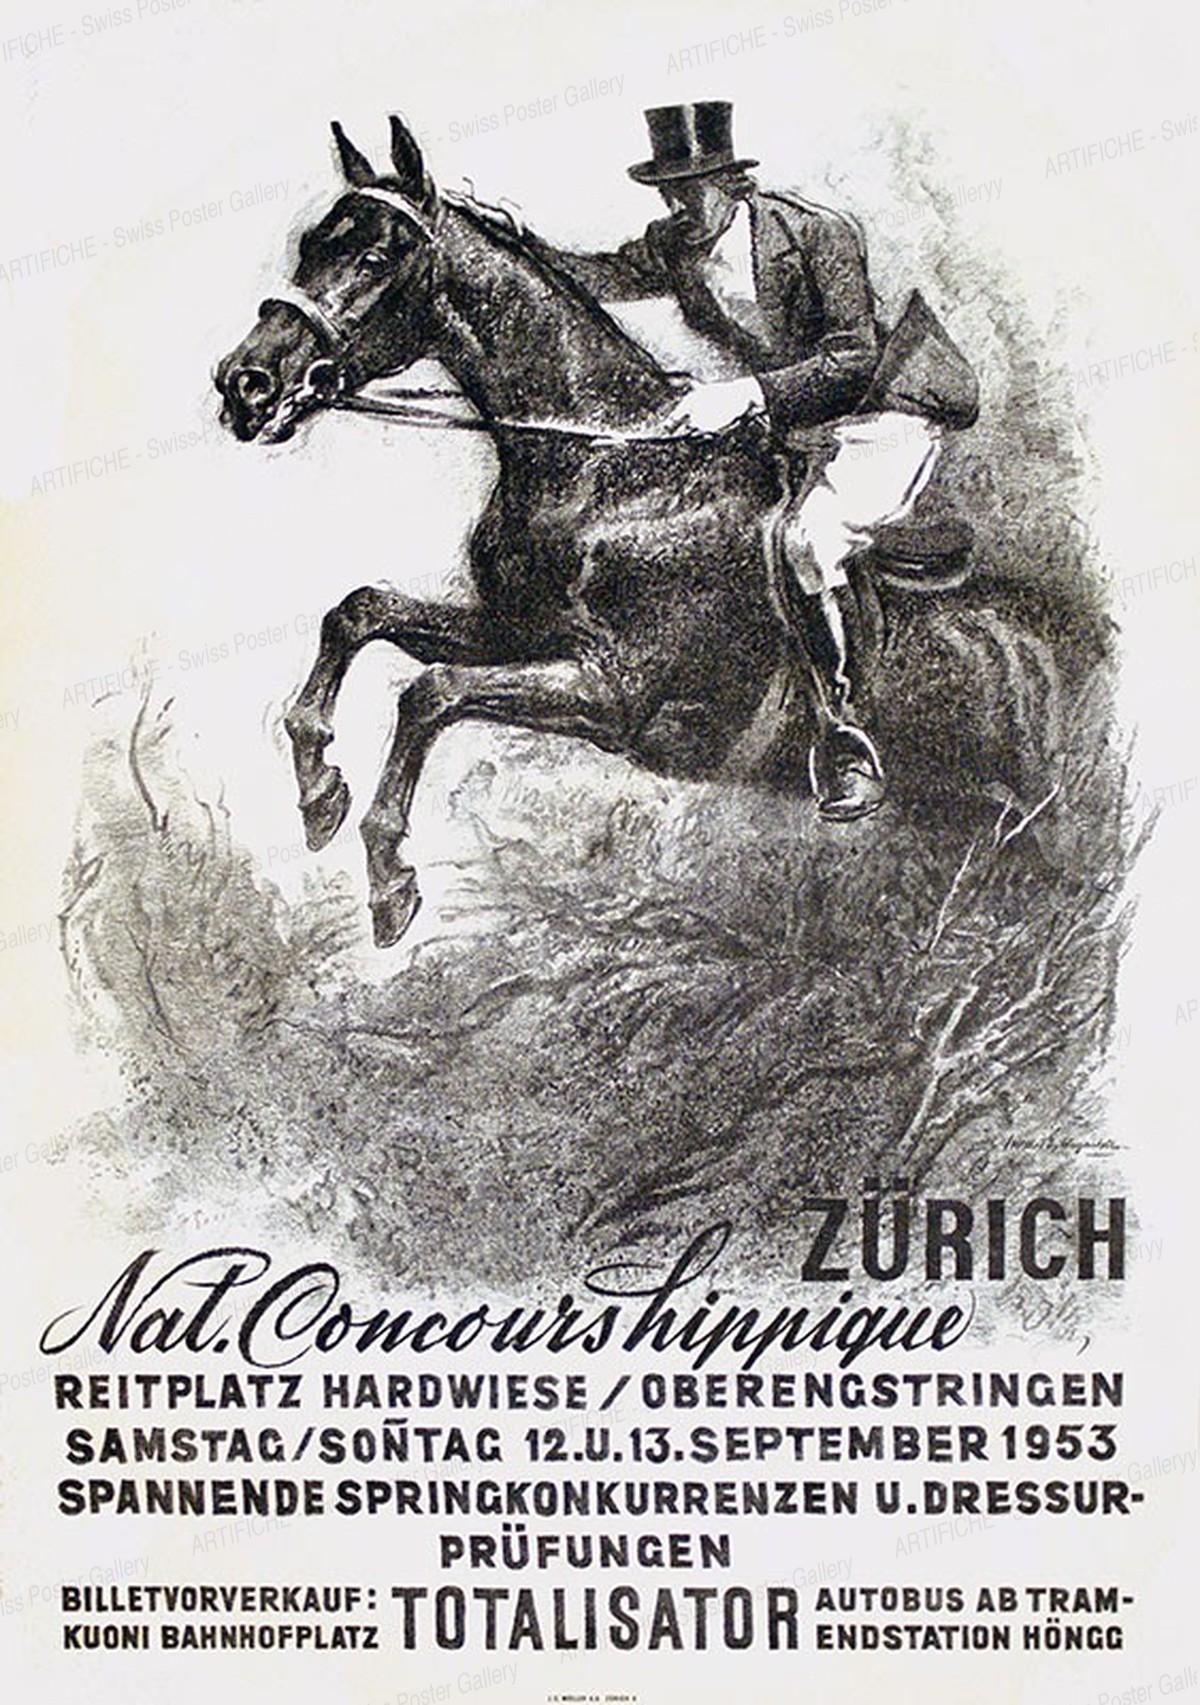 Nat. Concours Hippique Zürich – Reitplatz Hardwiese, Iwan Edwin Hugentobler